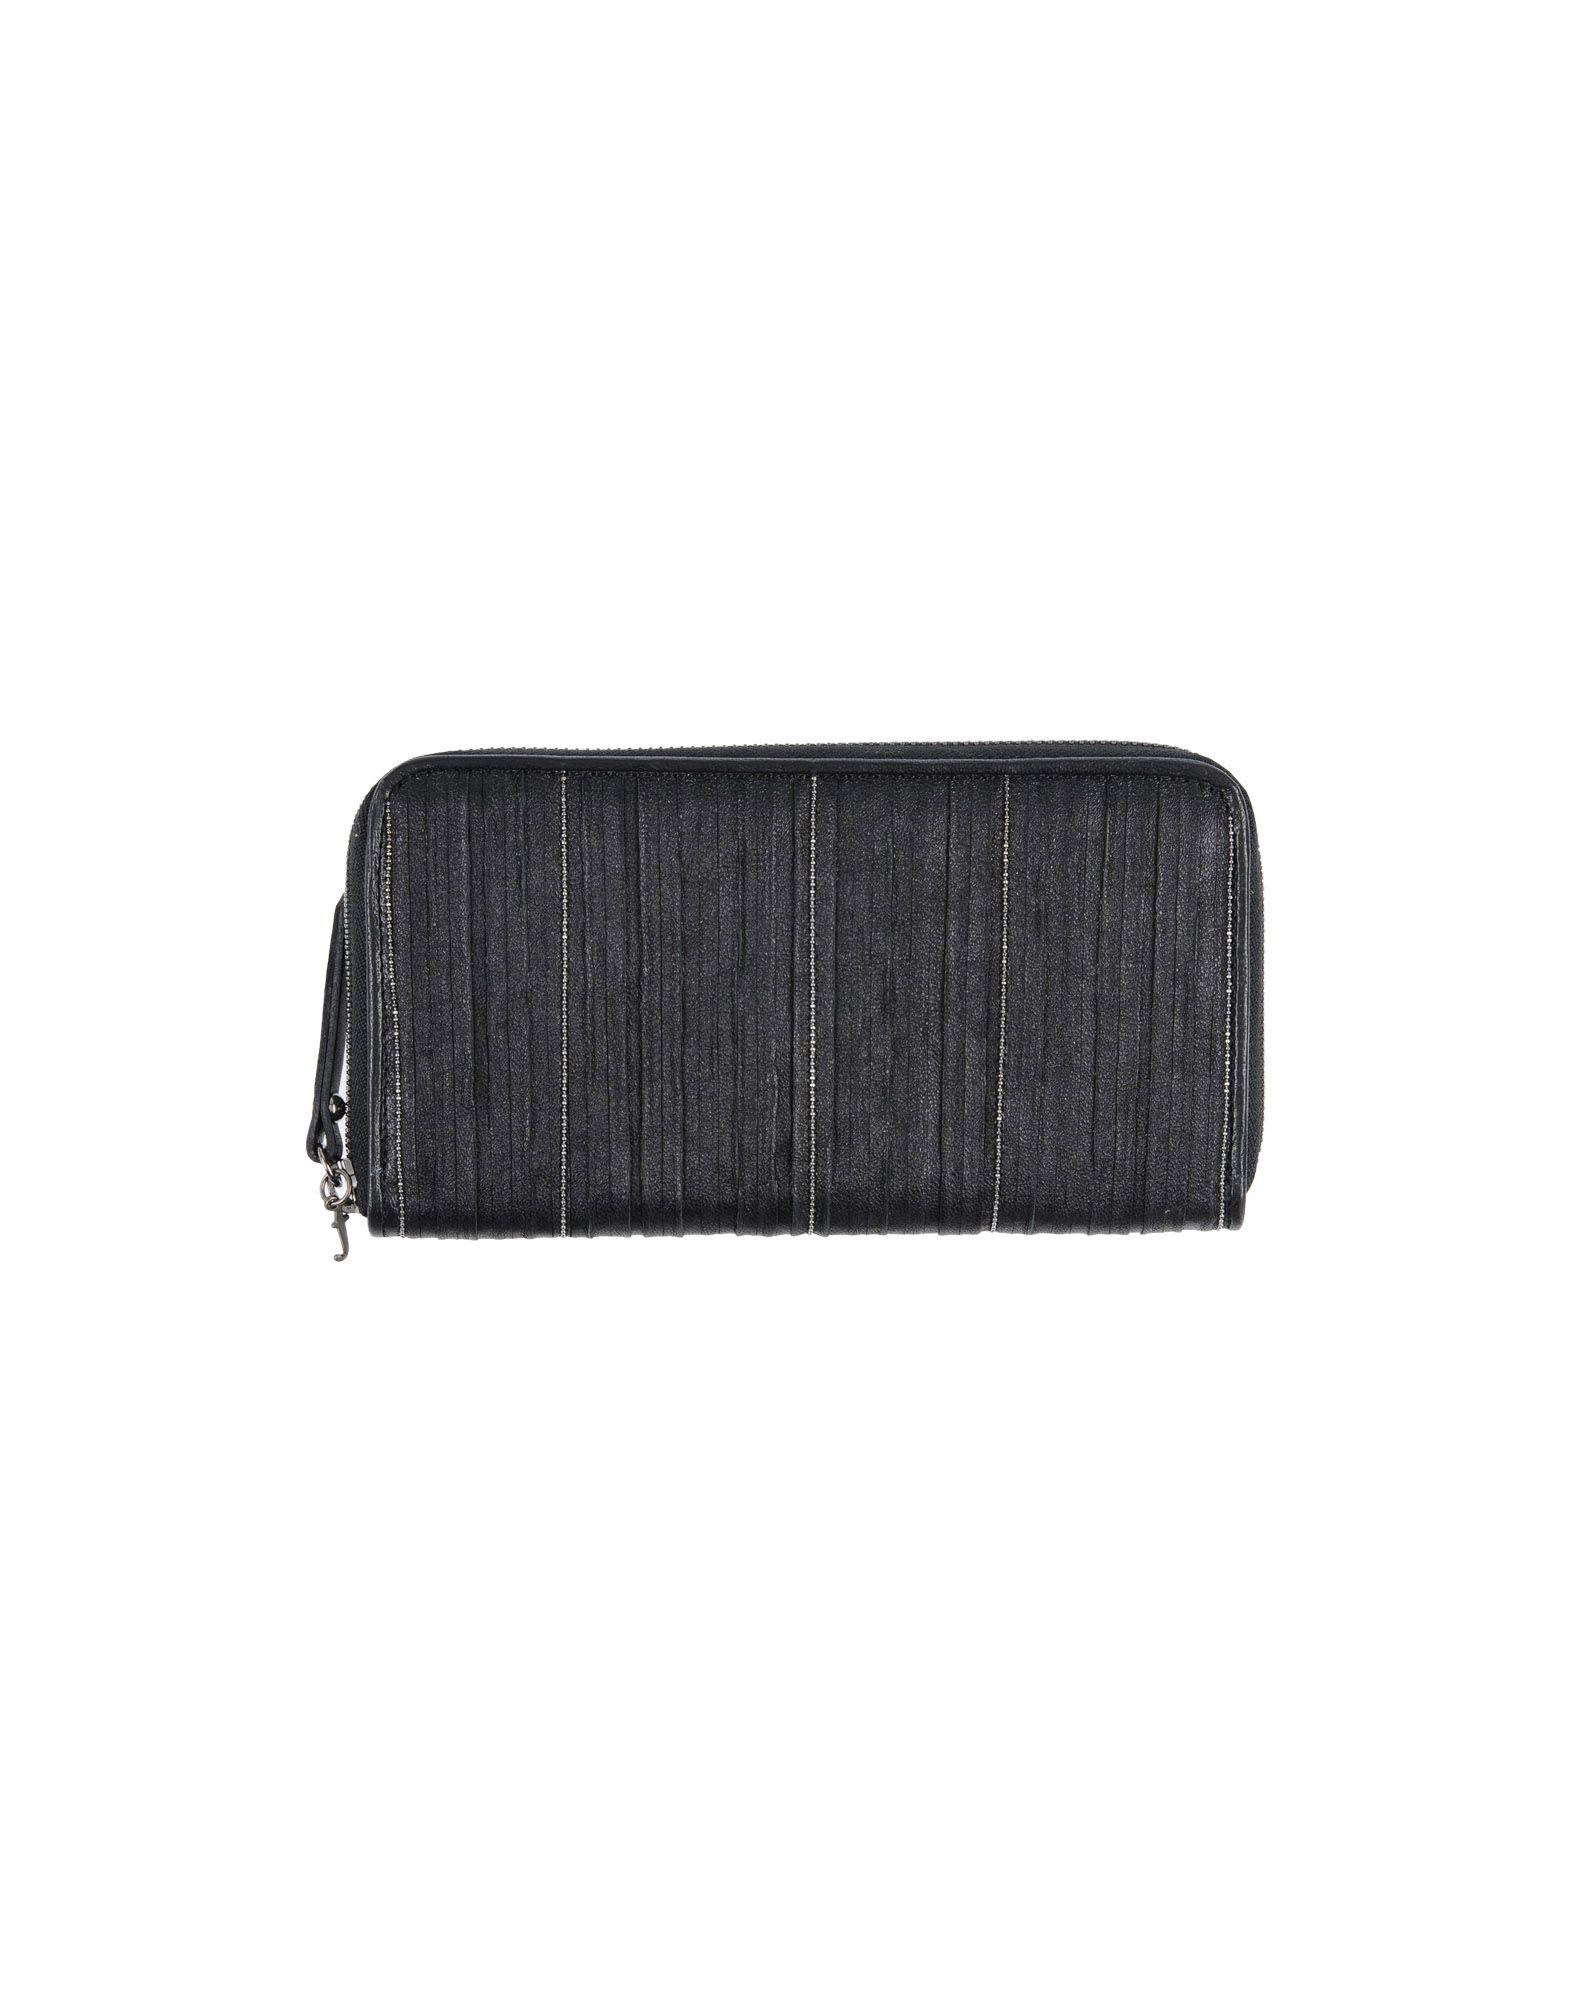 Small Leather Goods - Wallets Fabiana Filippi g4n2GtLRLN